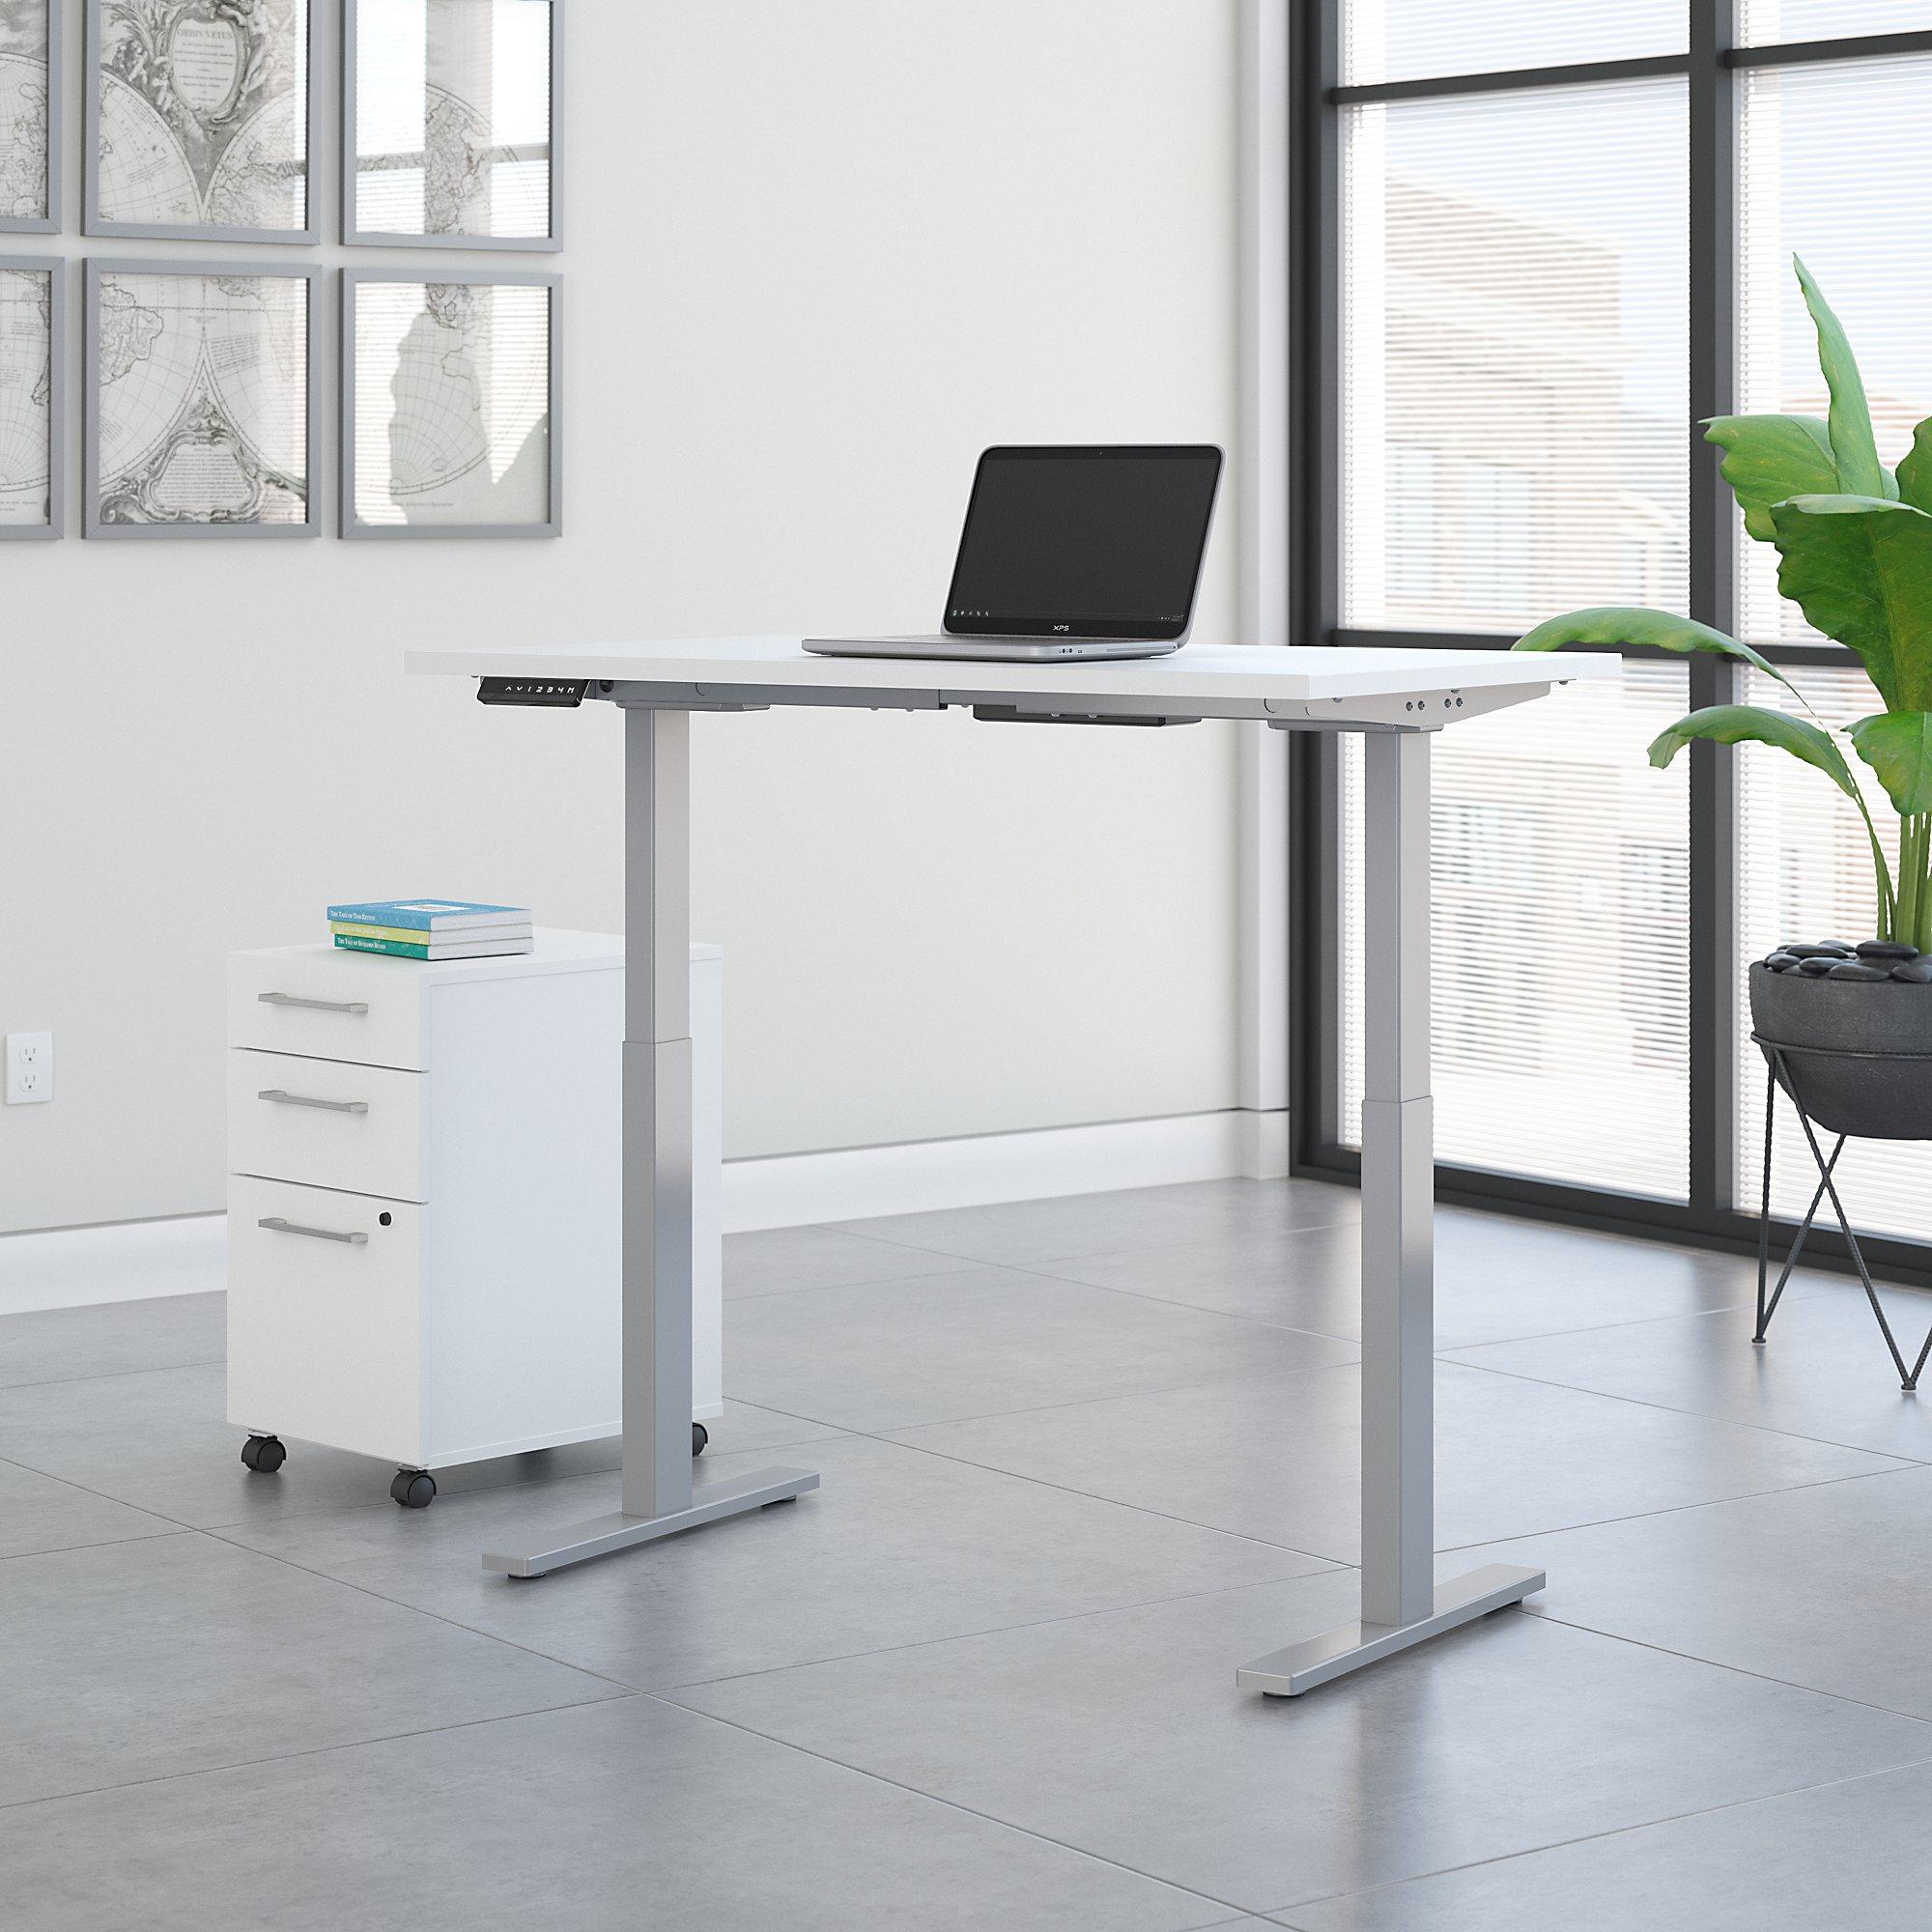 move 60 white 48 x 30 adjustable desk with file